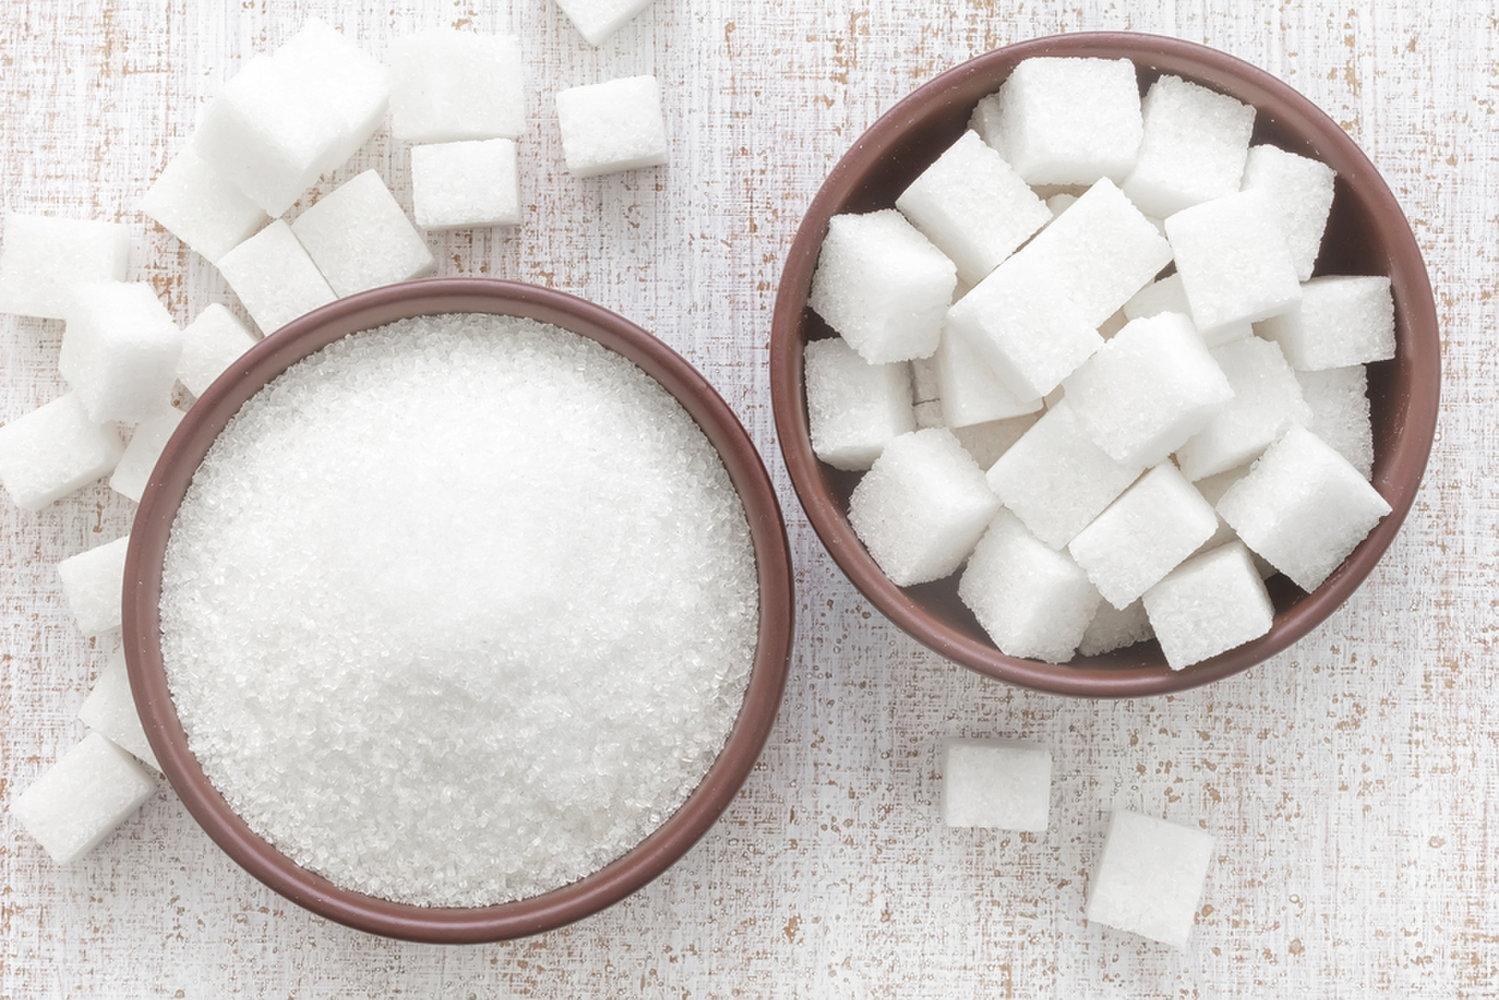 Sugar Swap: Human Brain Converts Glucose Into Fructose